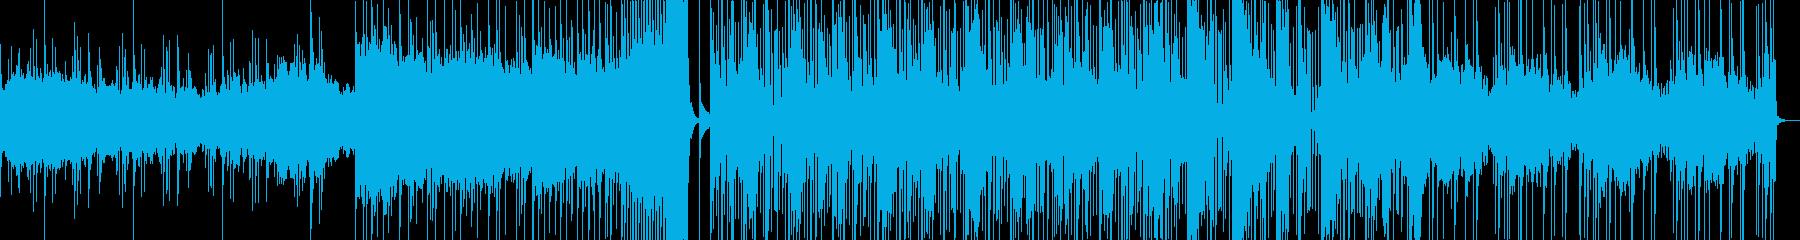 【CM】哀愁漂うアンビエント・ポップの再生済みの波形